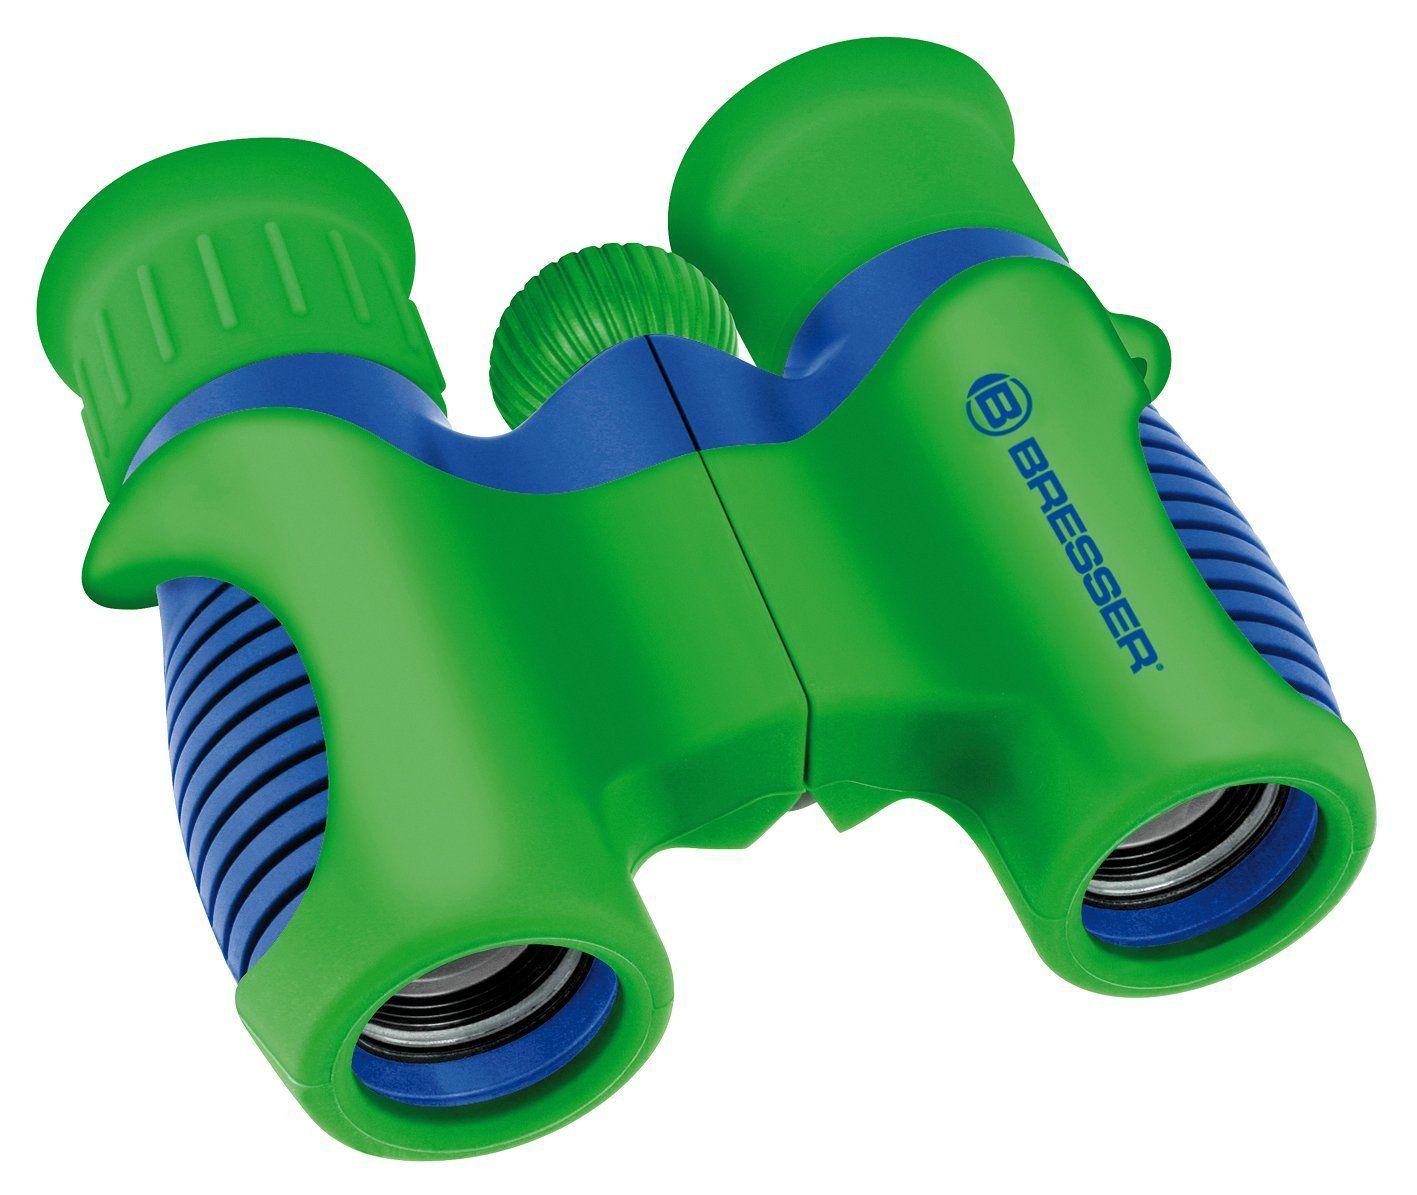 Amazon.com: ExploreOne 6x21 Binoculars: Toys & Games ...